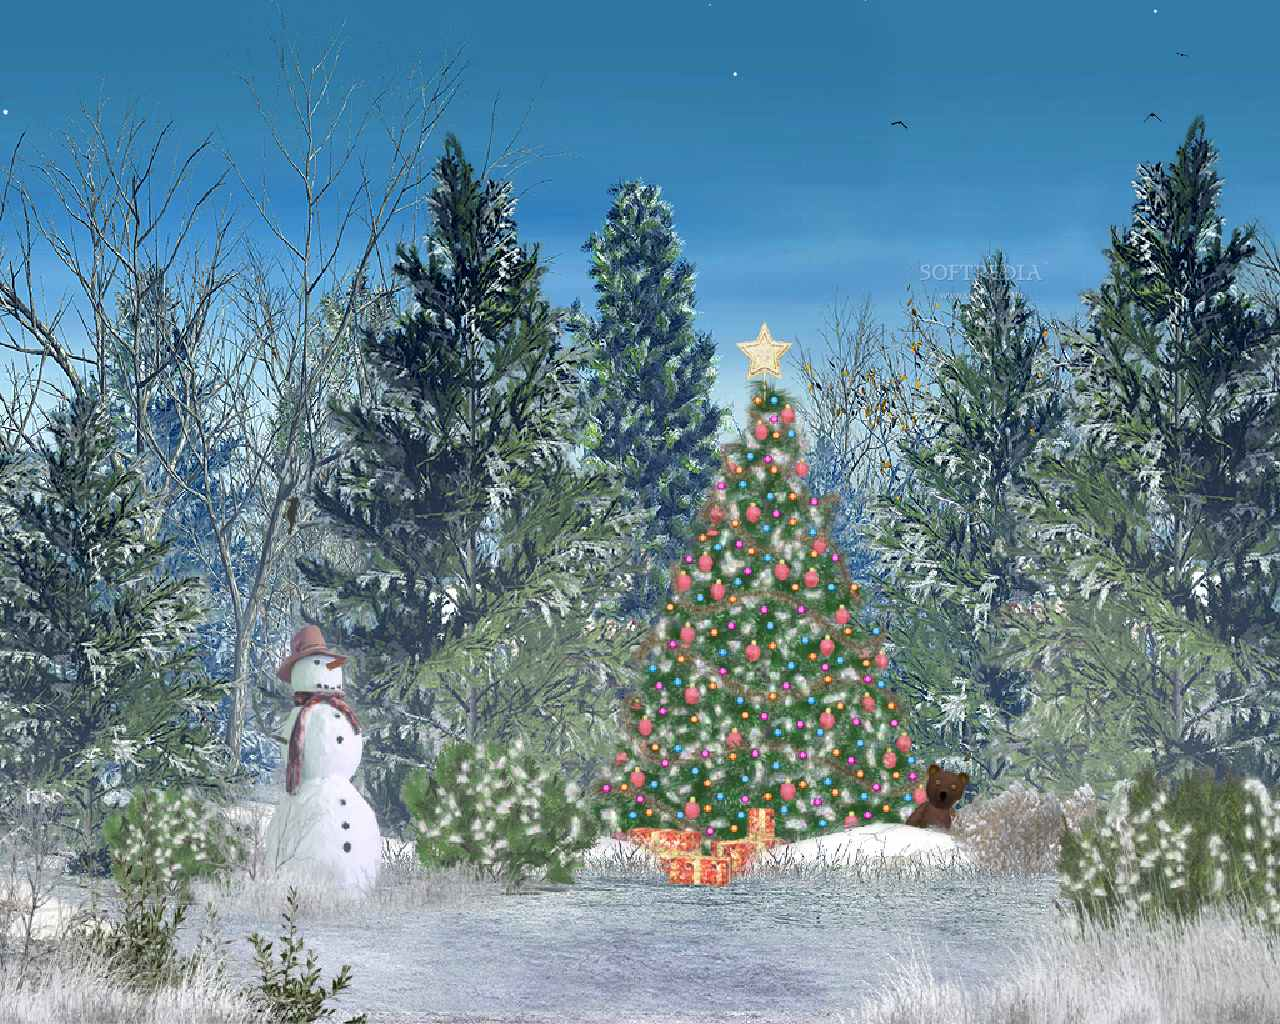 Free Desktop Christmas Wallpaper Backgrounds Wallpapersafari